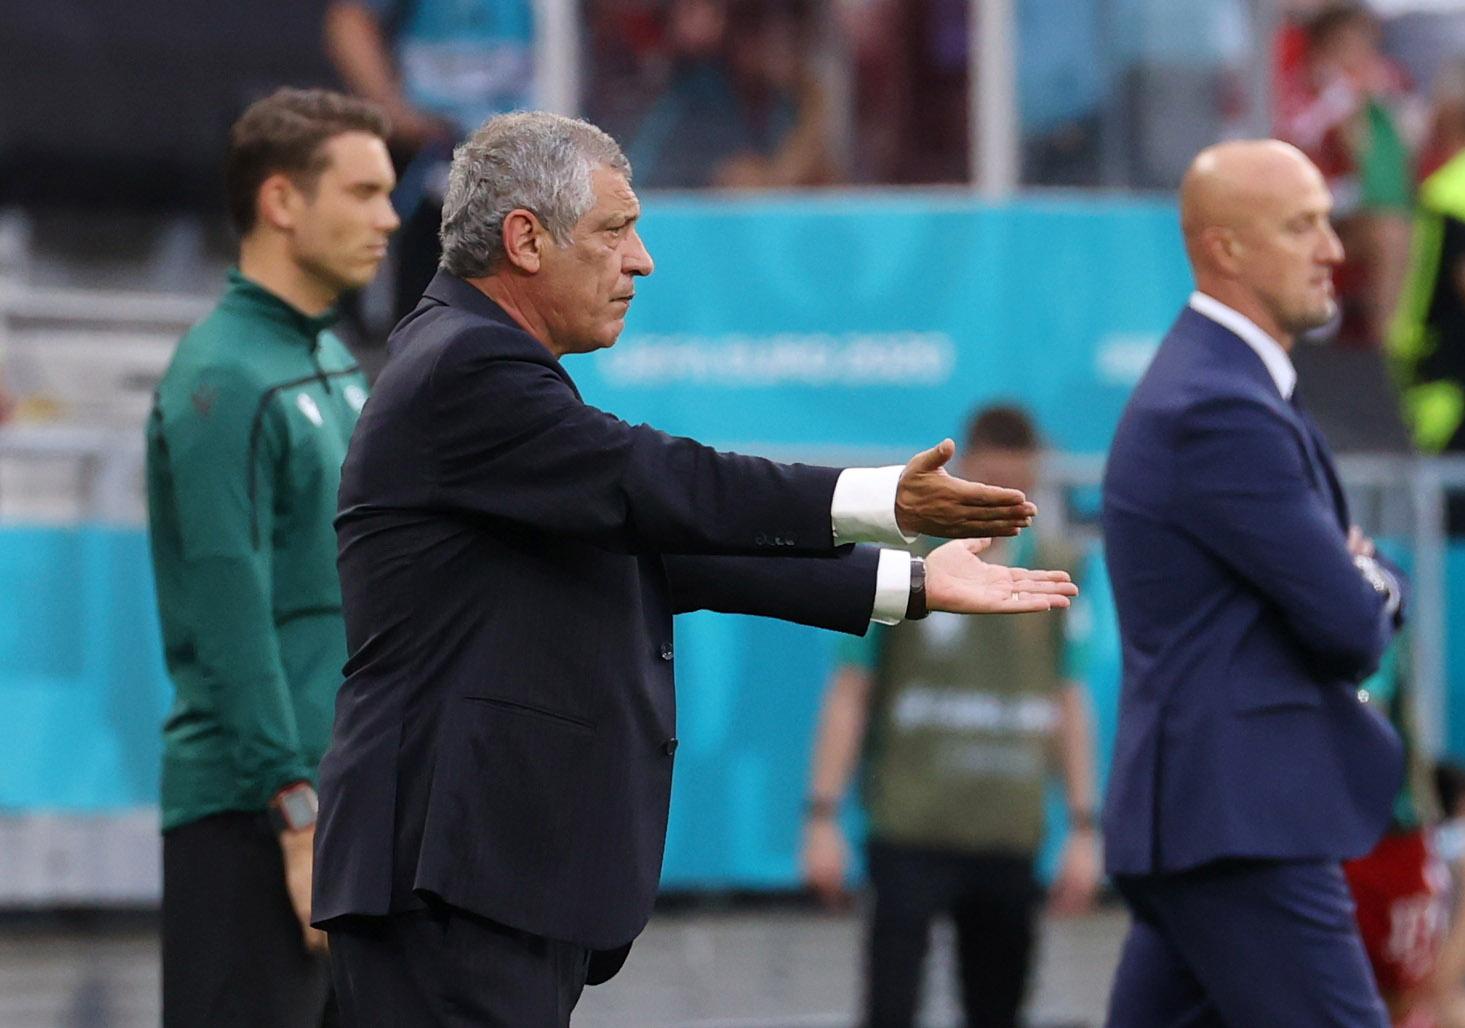 Euro 2020: Έξαλλος ο Φερνάντο Σάντος με ένα φάουλ στον Μπρούνο Φερνάντες